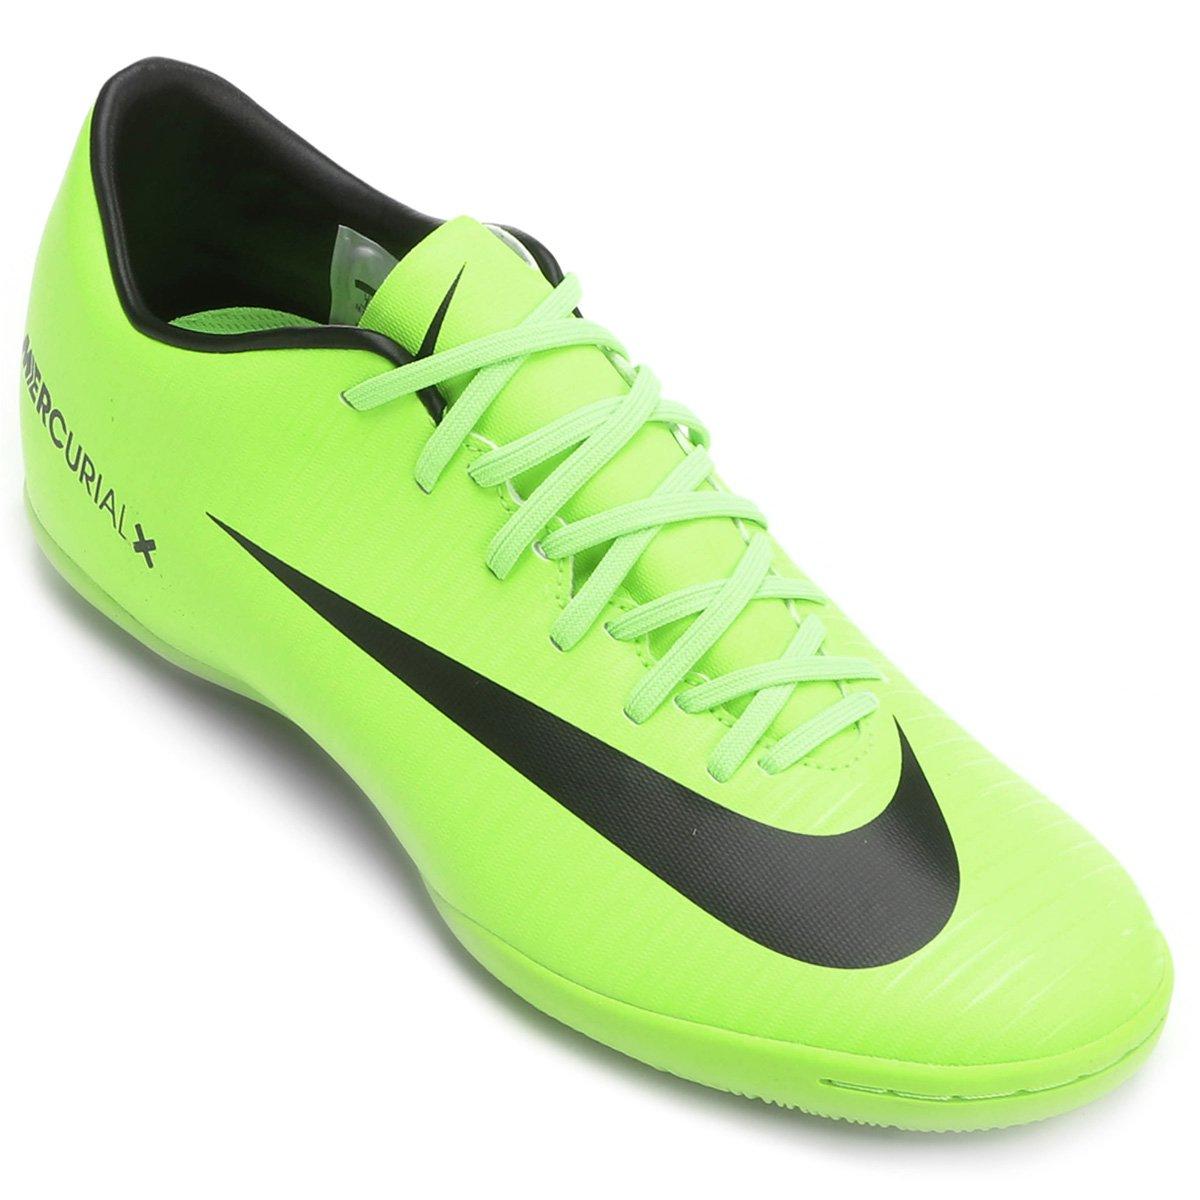 Chuteira Futsal Nike Mercurial Victory 6 IC - Compre Agora  a6faca5bb87d3